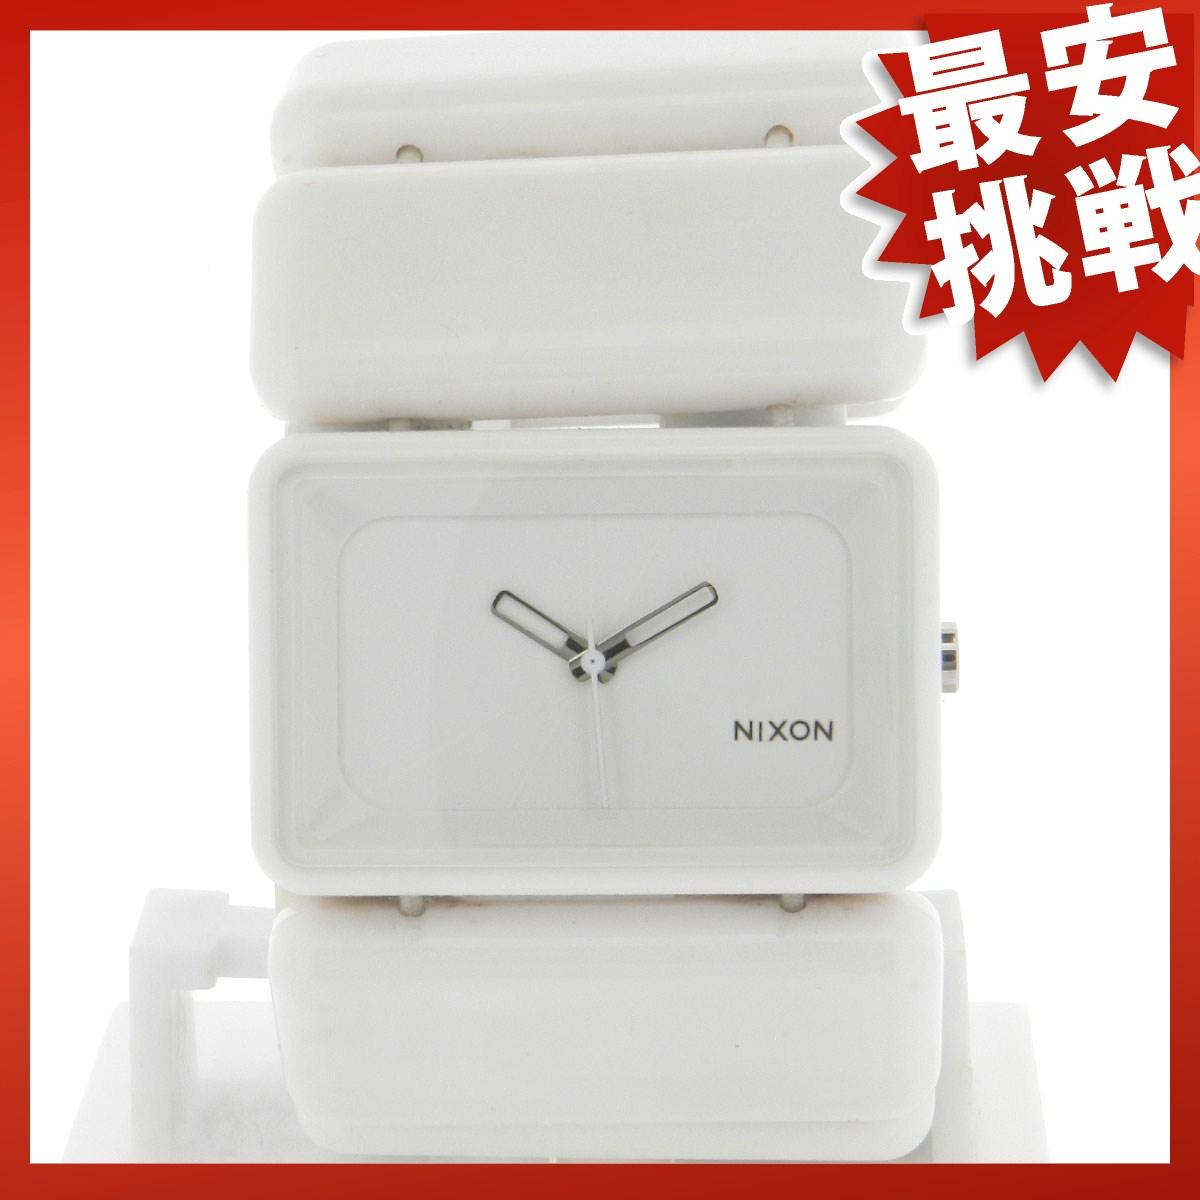 Nixon Vega watch plastic men's